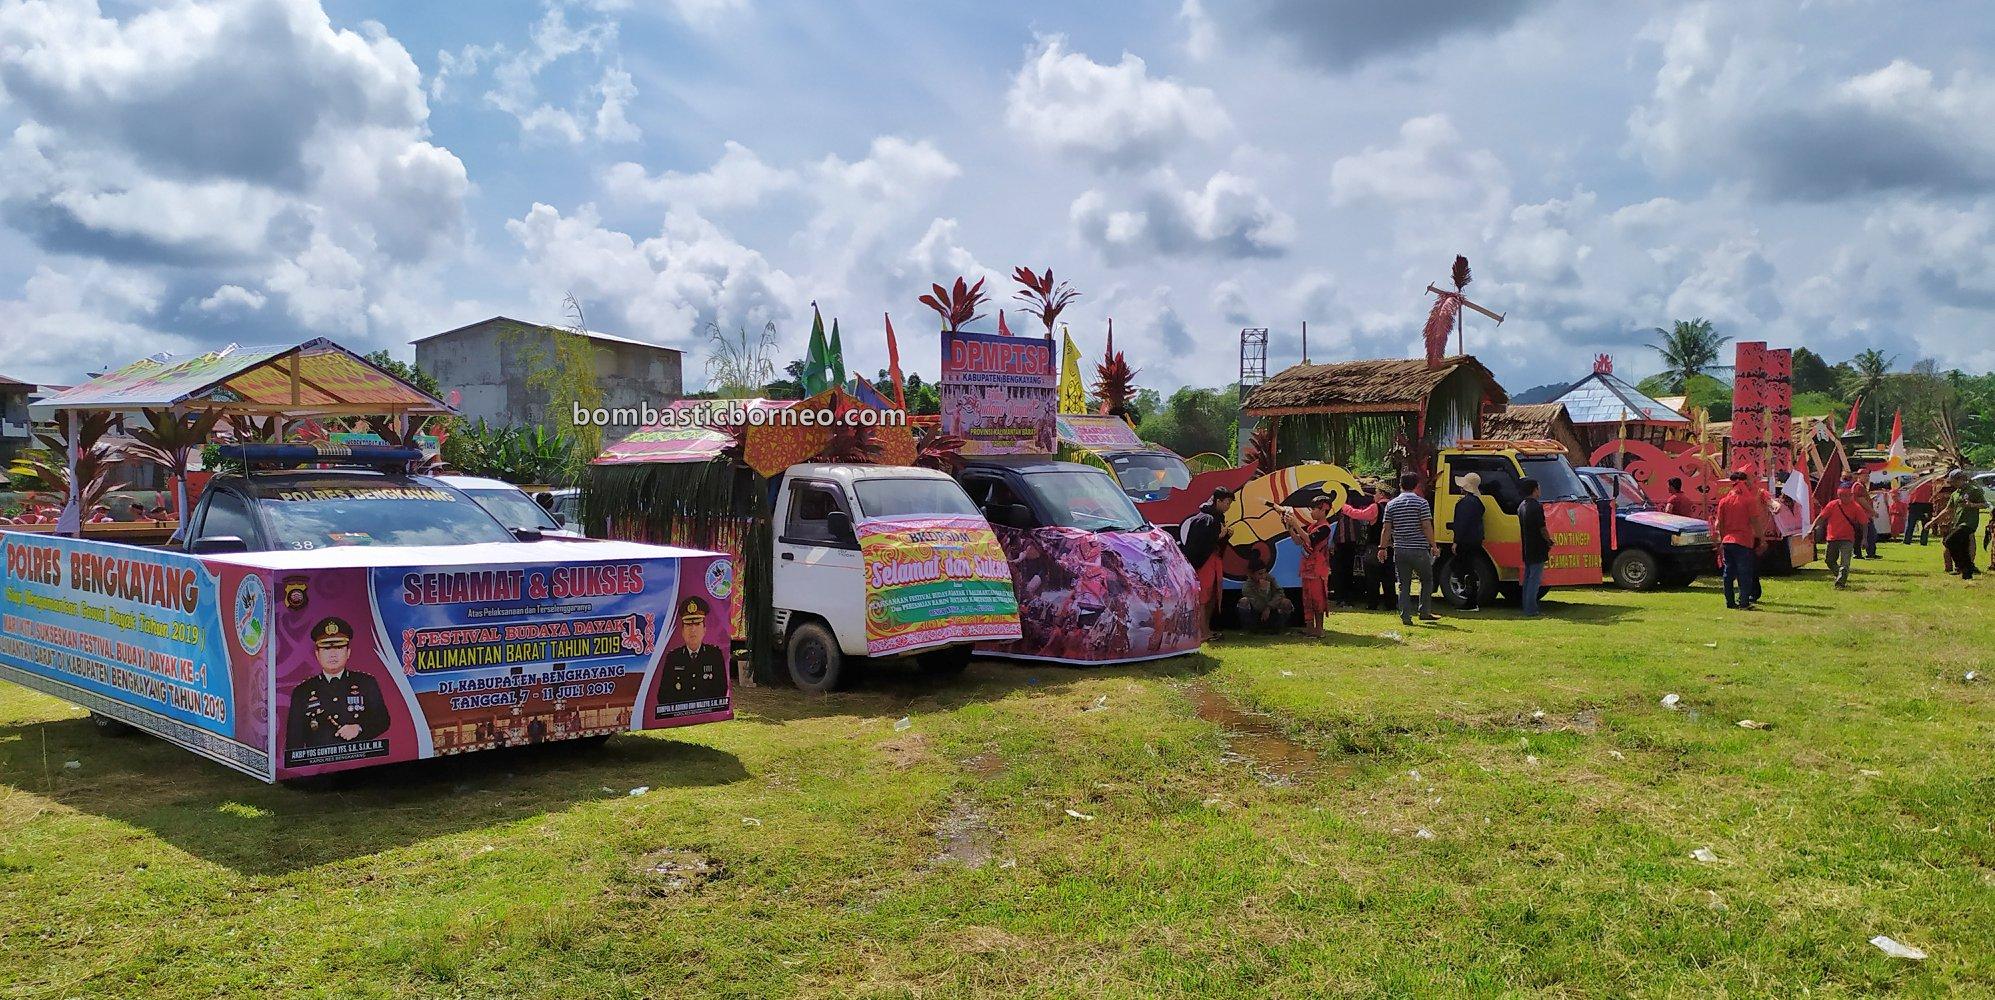 culture, event, native, tribe, Kalimantan Barat, Tangkitn raksasa, backpackers, destination, Tourism, travel guide, Trans Border, Borneo, 跨境婆罗洲游踪, 西加里曼丹孟加映, 印尼原住民文化,